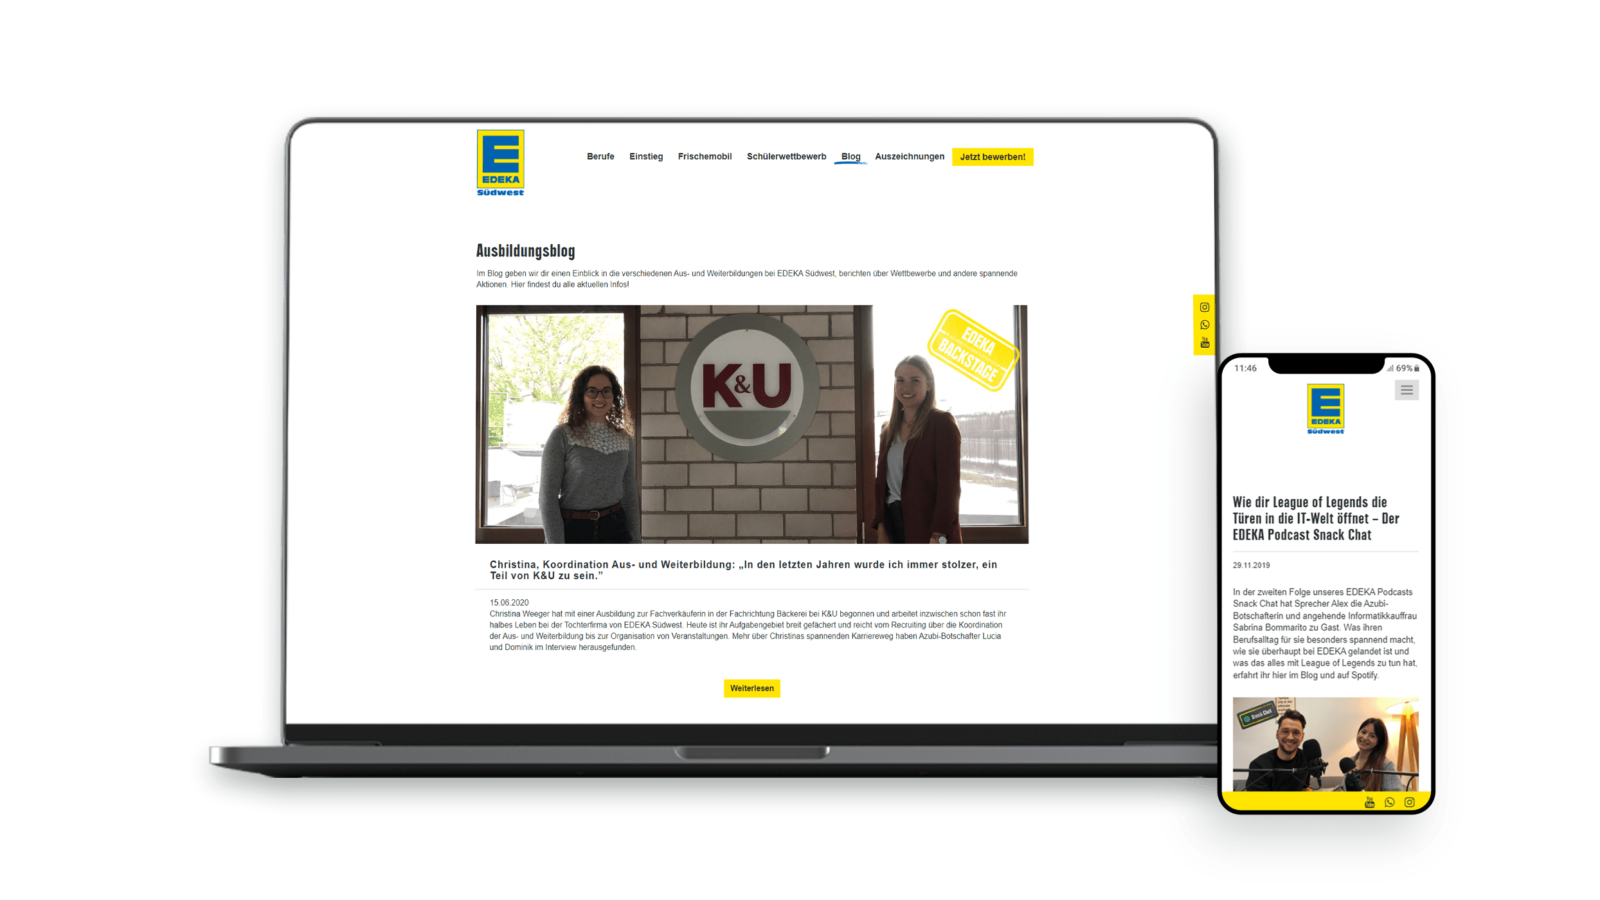 EDEKA Ausbildungskampagne Desktop Mockup